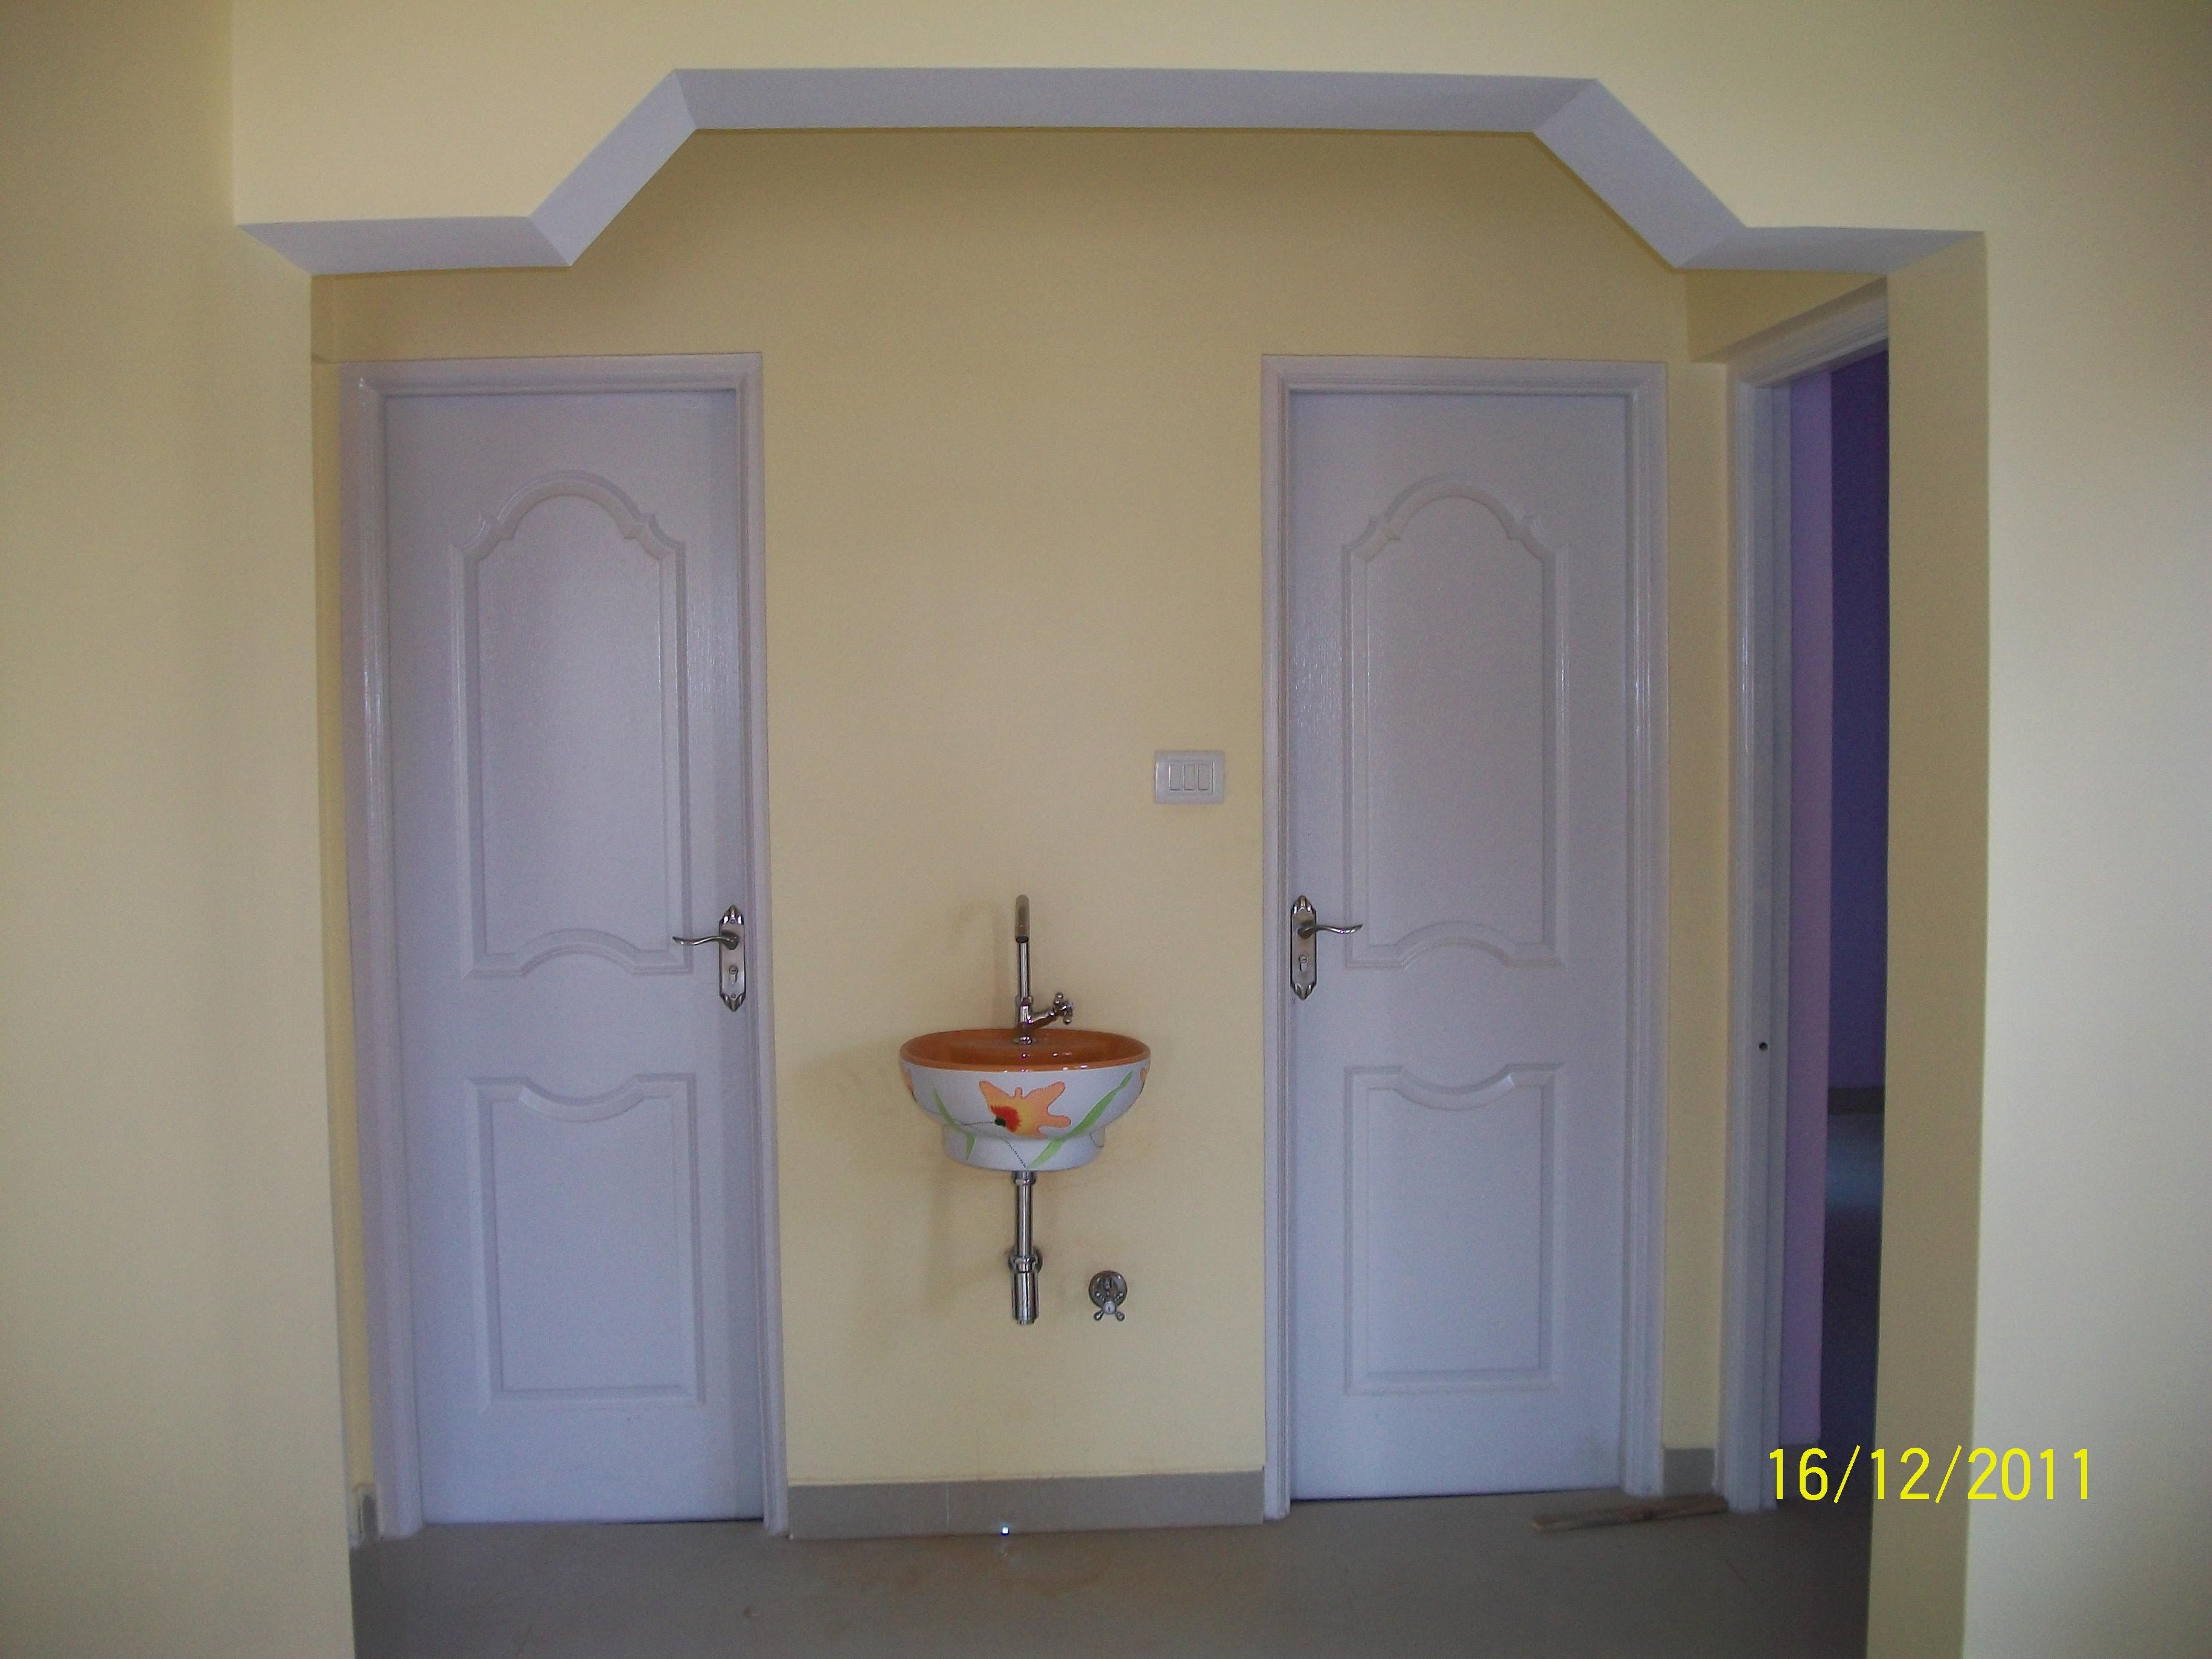 door ke design dikhaye  | 679 x 1024